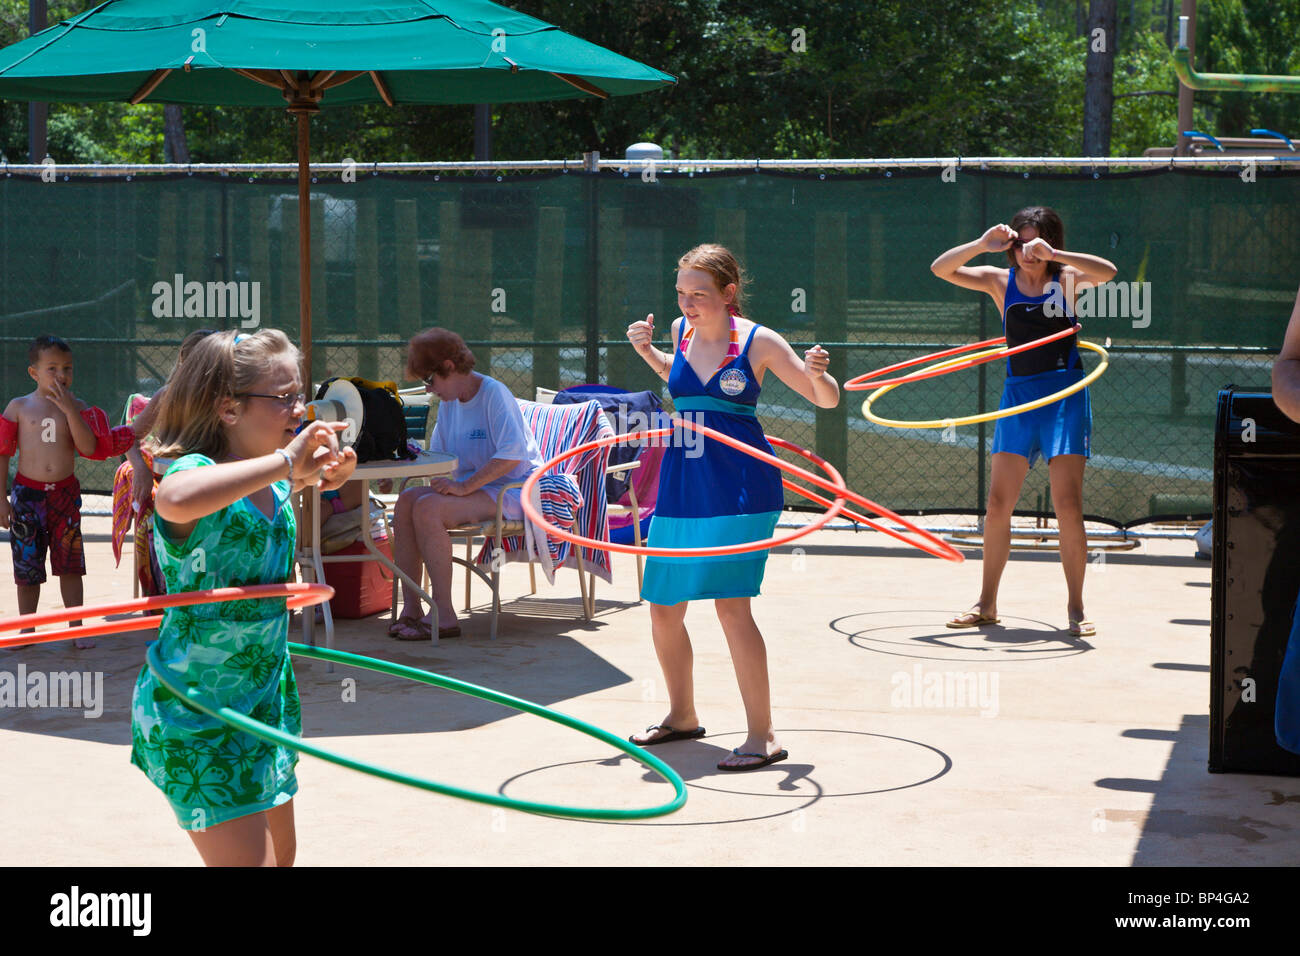 Walt Disney World, FL - May 2009 - Girls compete in hula-hoop contest at Walt Disney's Fort Wilderness Resort - Stock Image